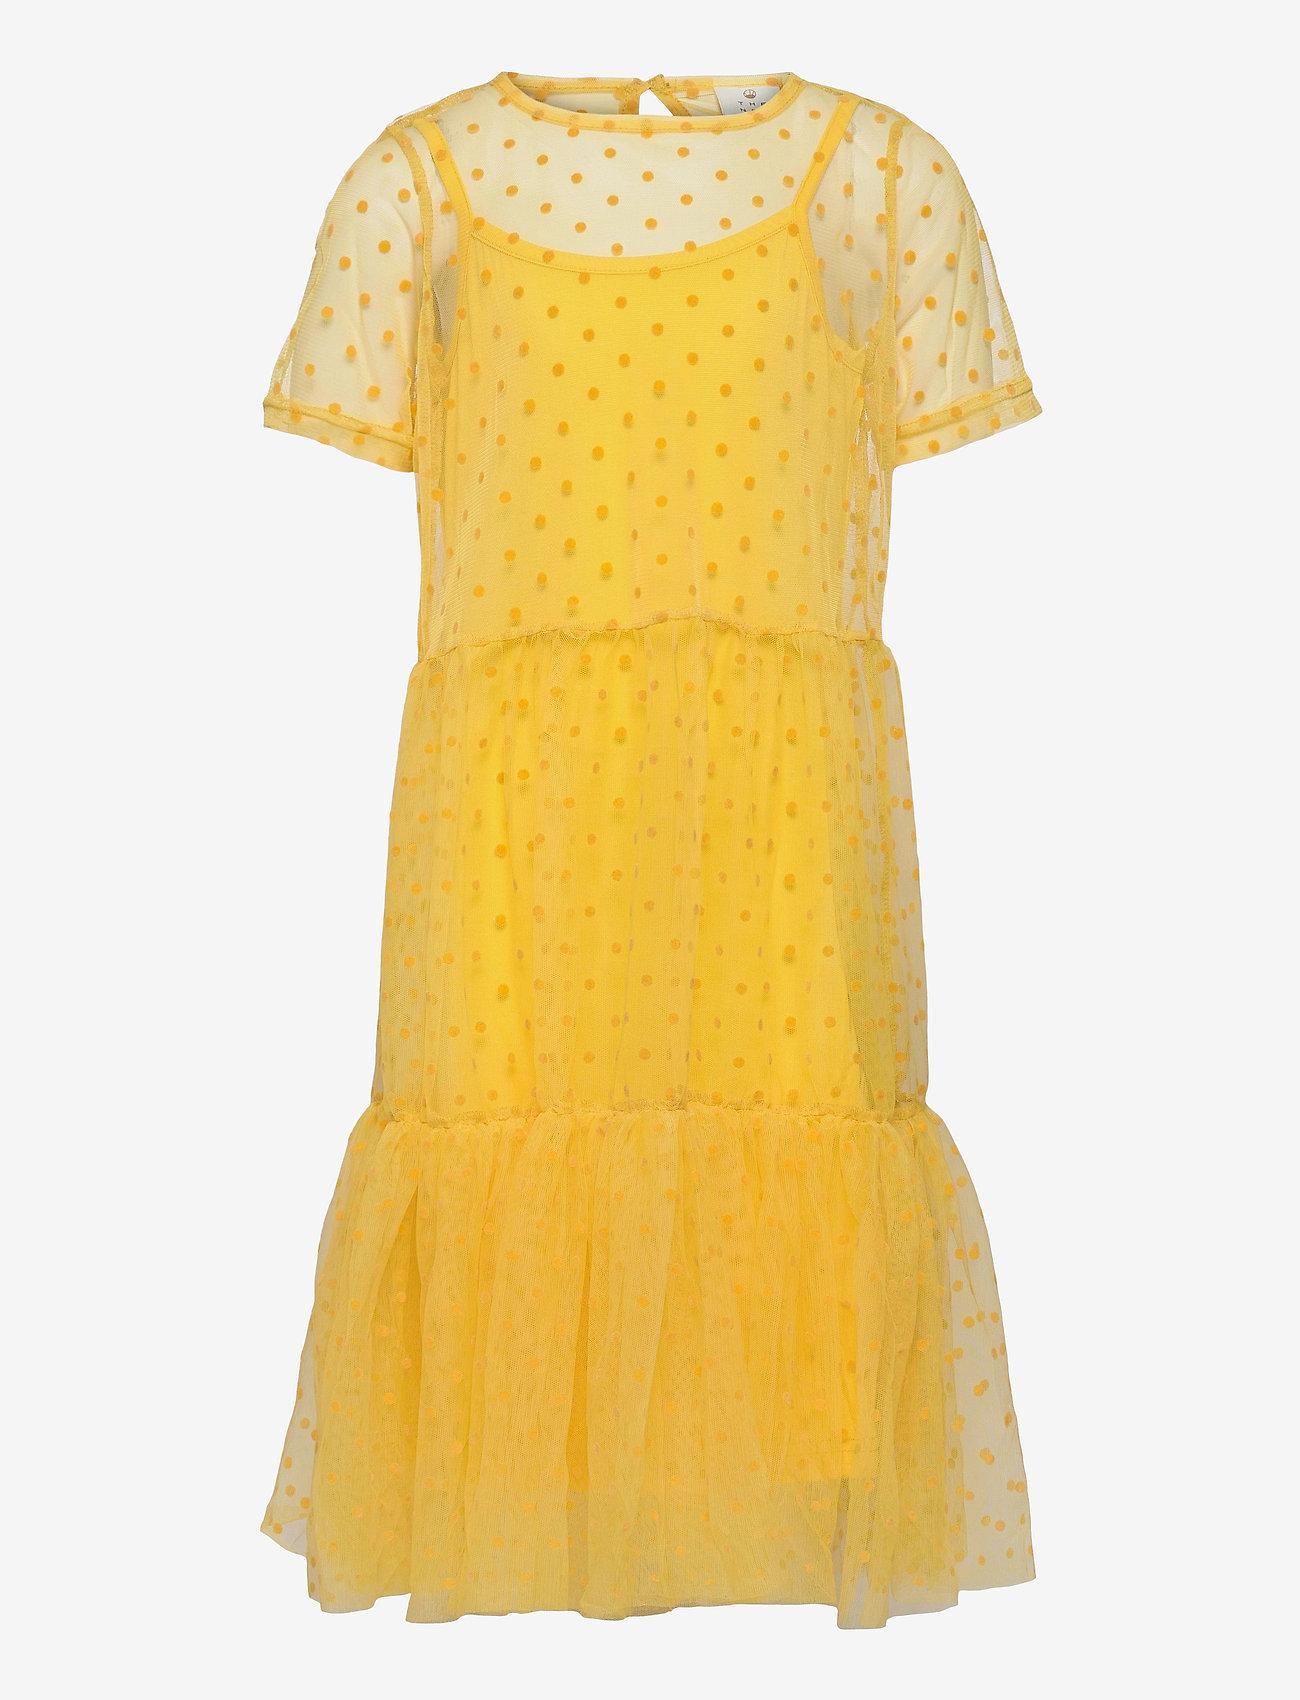 The New - UMA TWIST DRESS - kleider - primrose yellow - 0